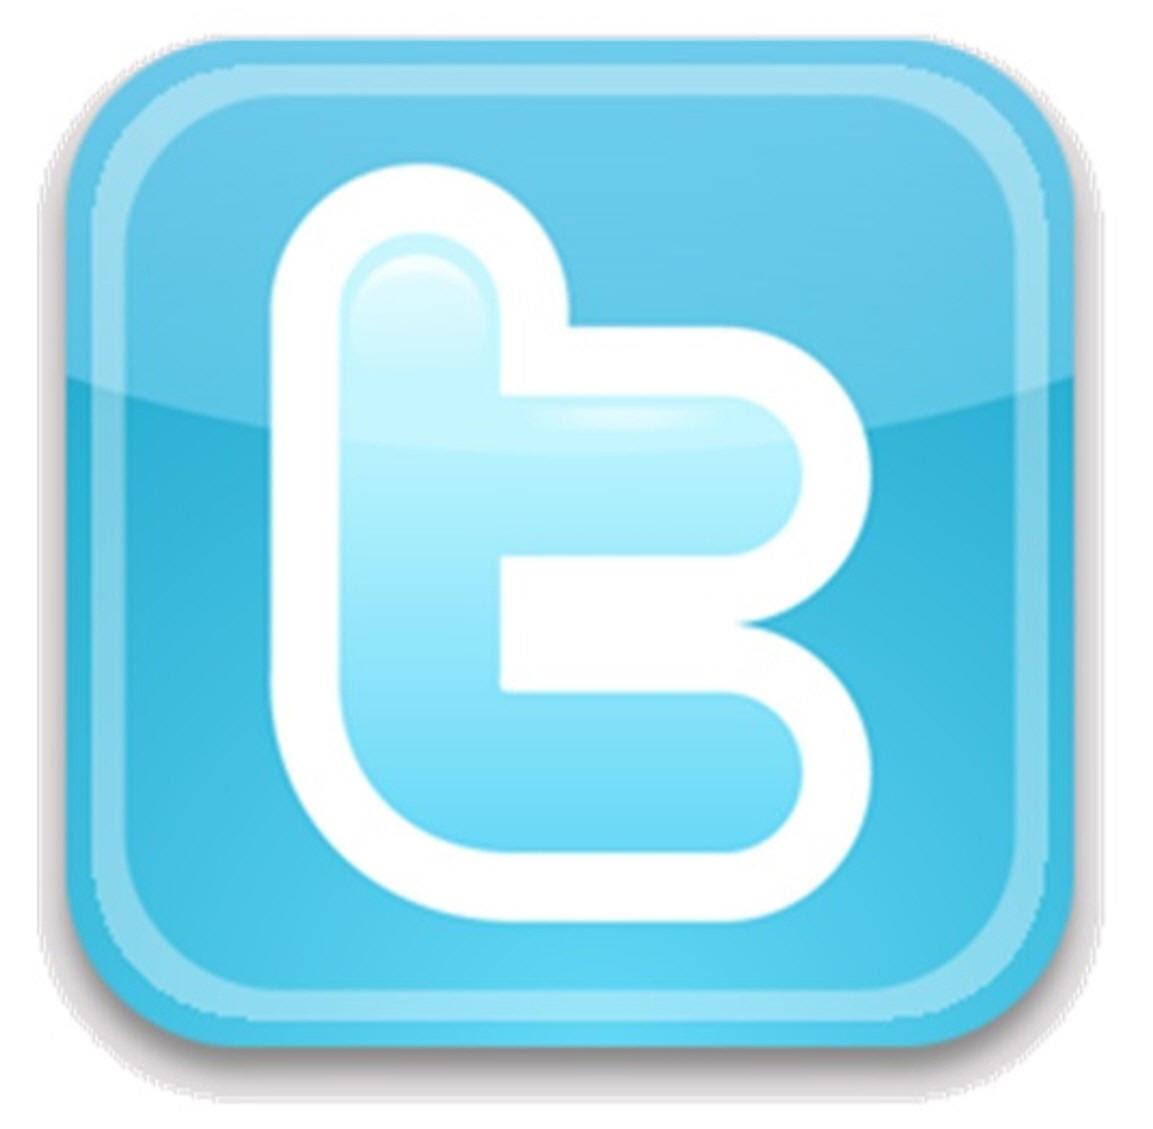 Situs Auto Follow, Retweet, Favorite Terbaru